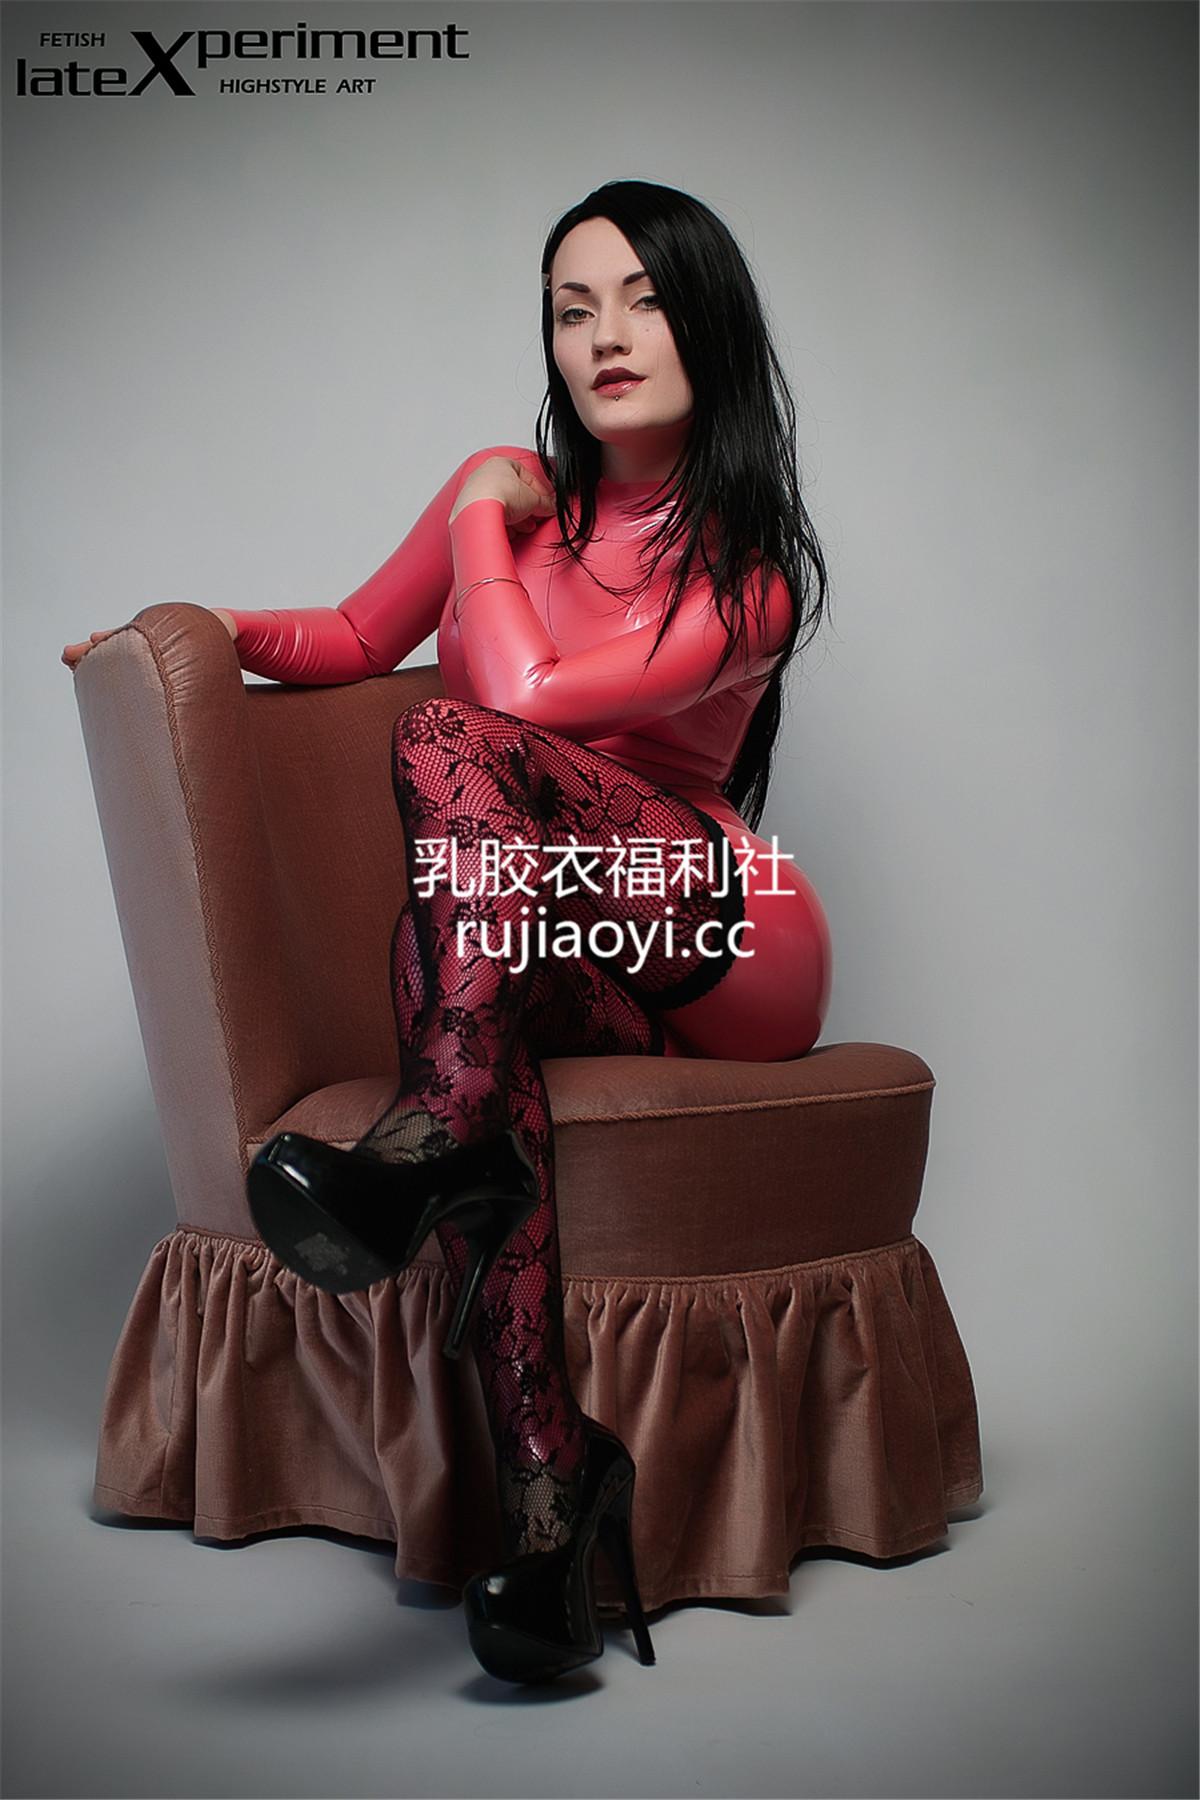 [LateXperiment] 粉红高跟网袜高挑嫩模乳胶衣诱人心魂